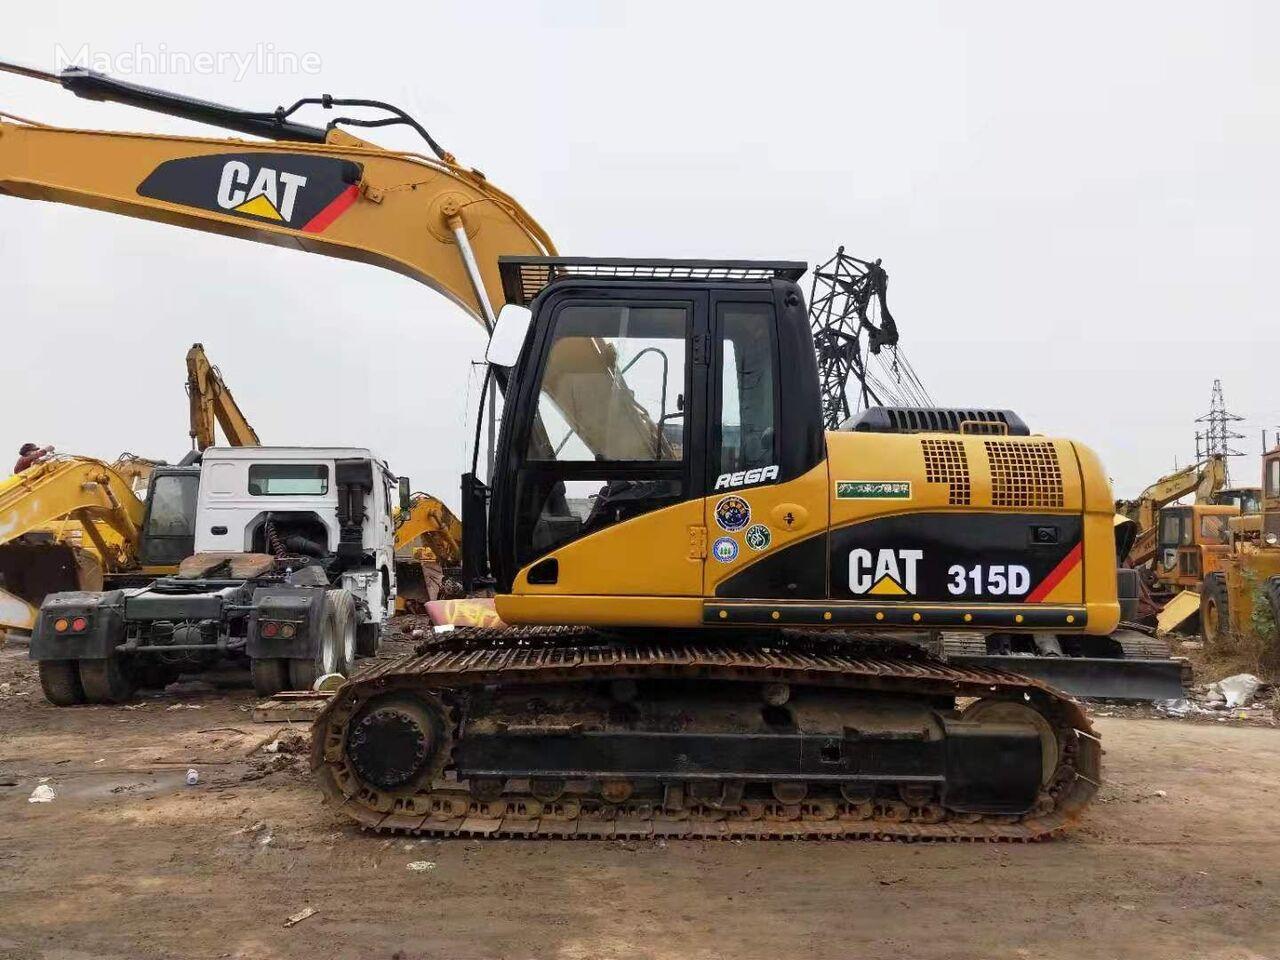 CATERPILLAR 315D tracked excavator